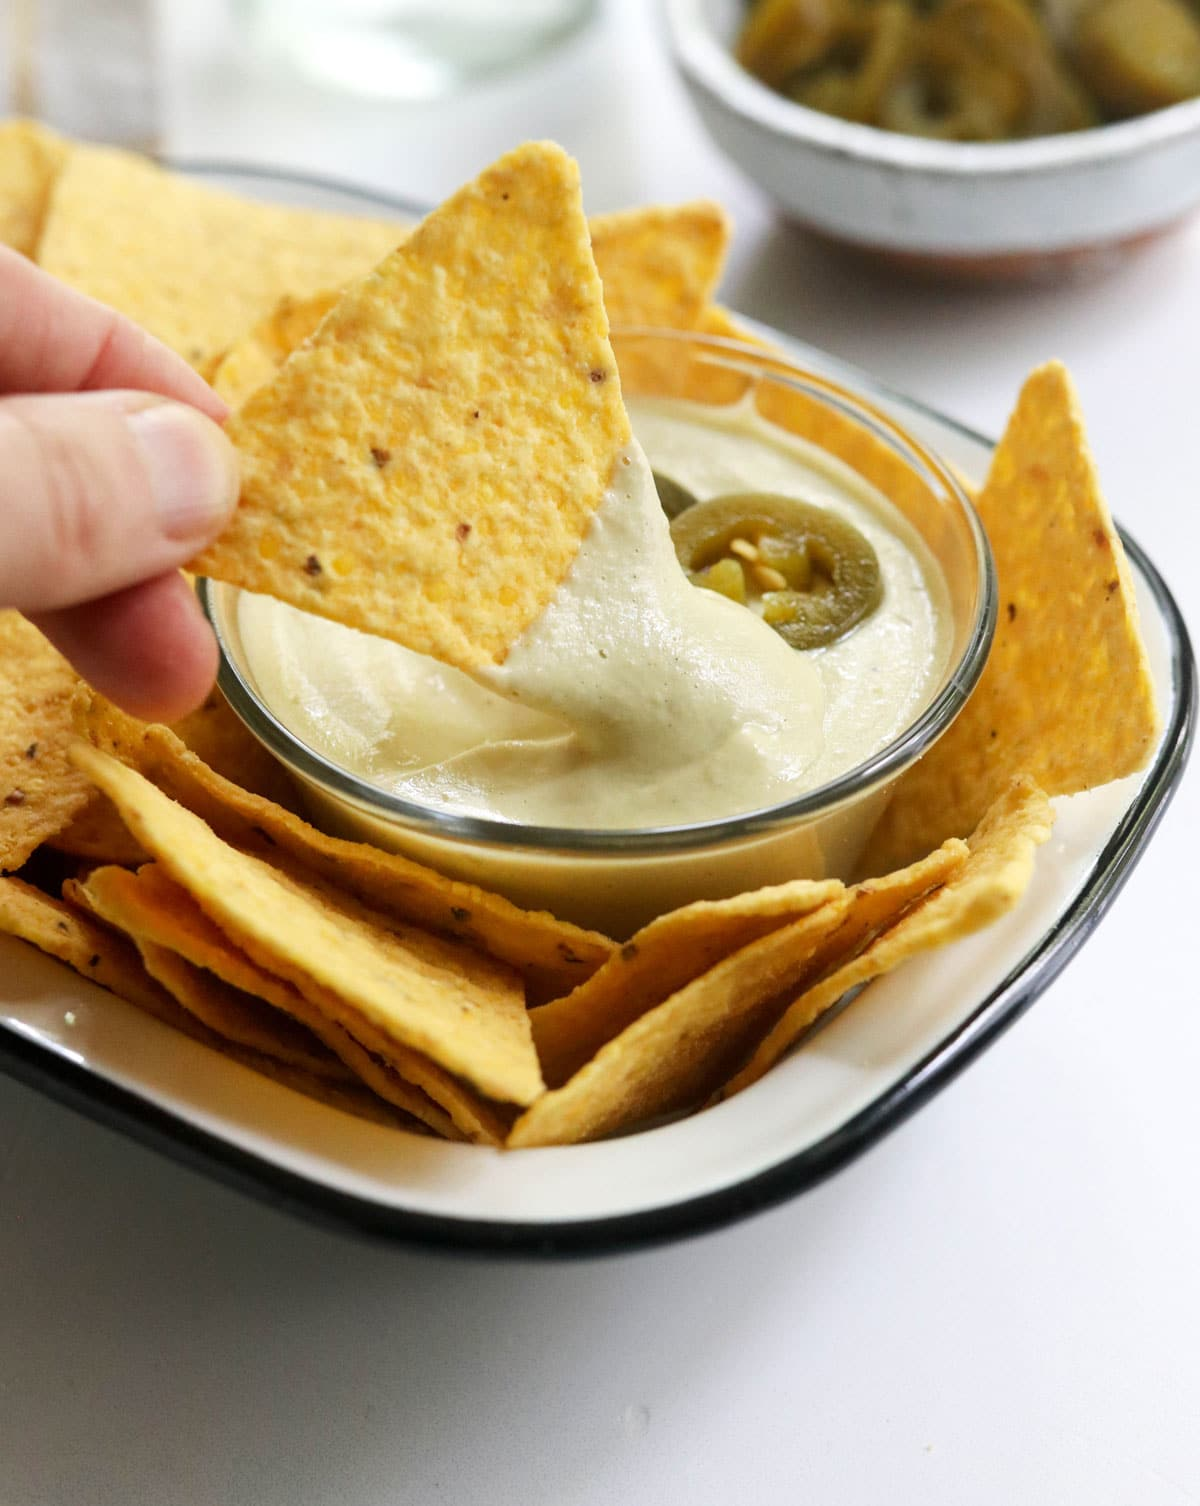 chip dipped in vegan nacho cheese sauce